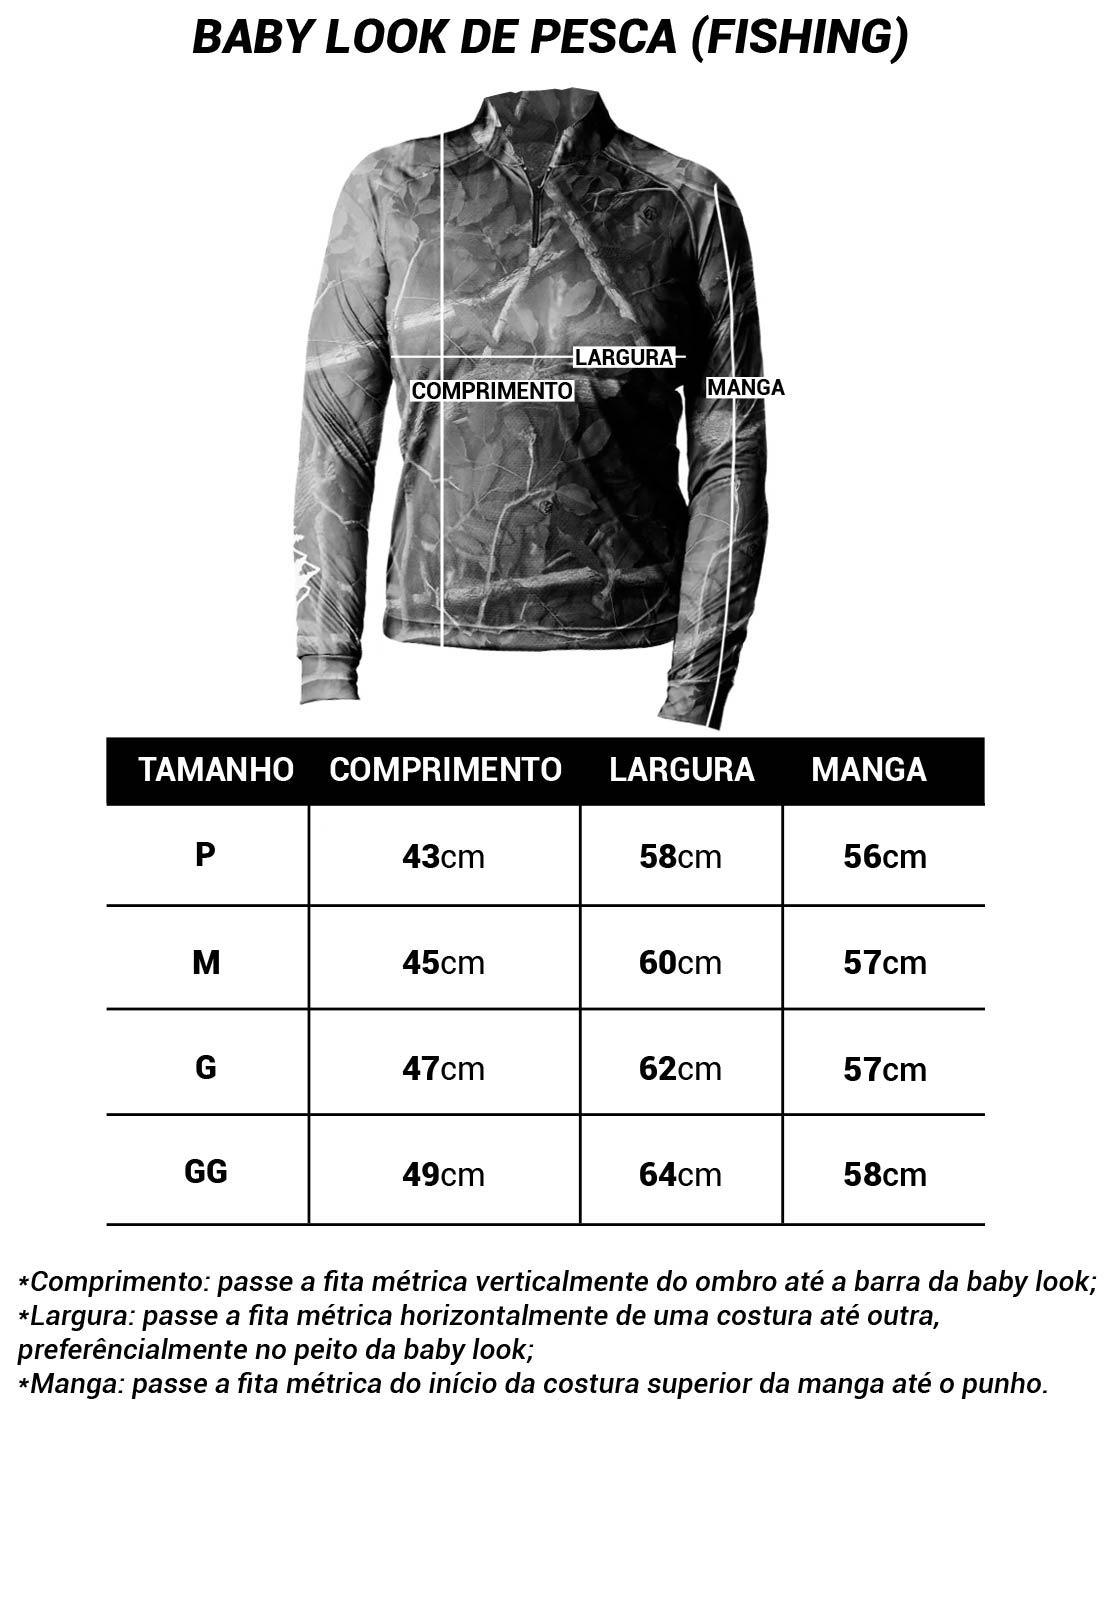 CAMISA DE PESCA FISH CAMUFLADA PRO 19 FEMININA + BANDANA GRÁTIS  - REAL HUNTER OUTDOORS